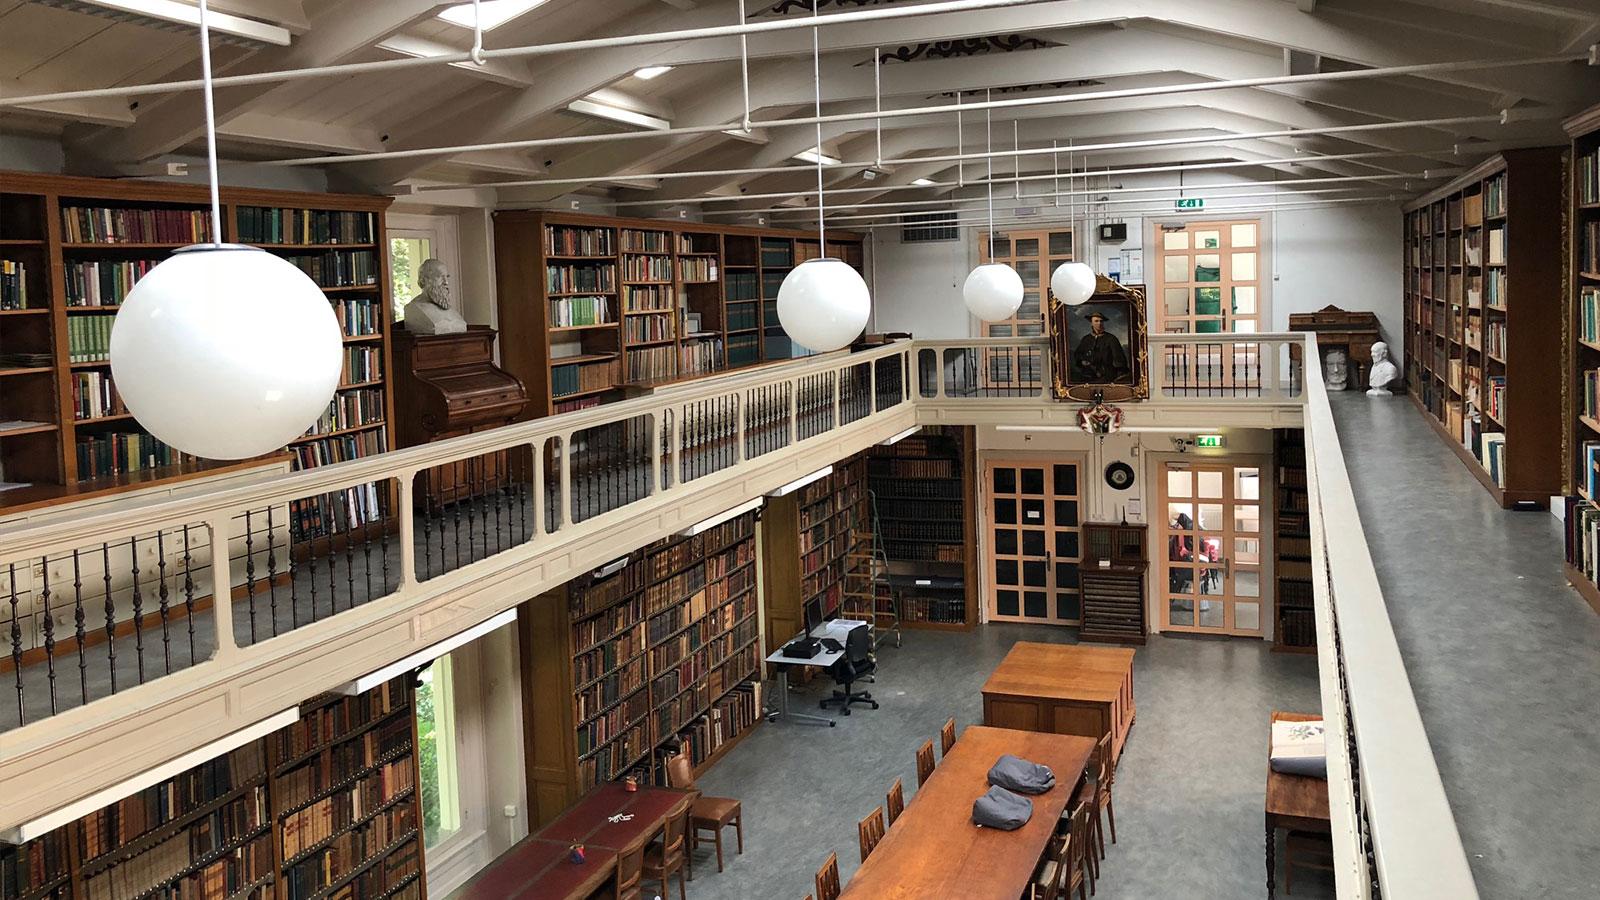 Artis bibliotheek fundering